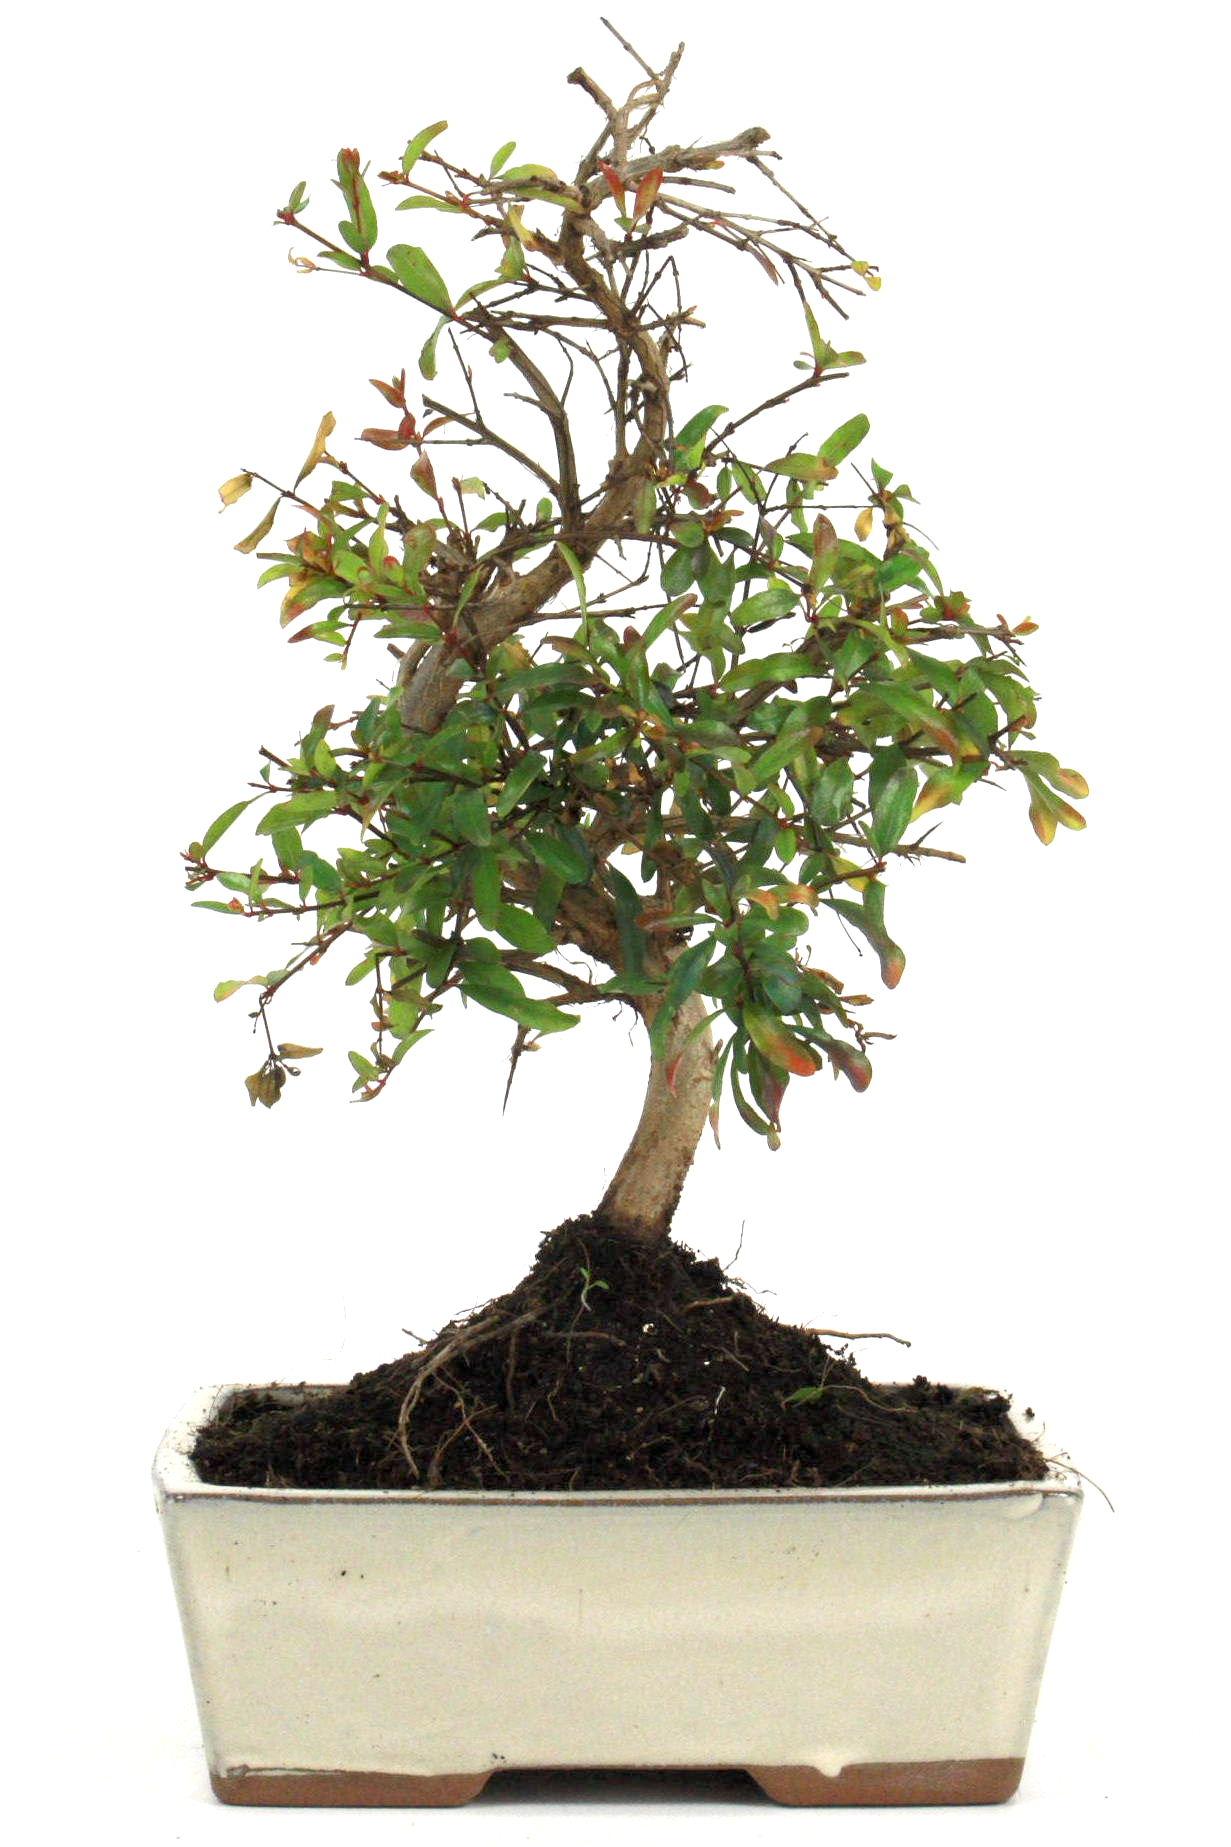 granatapfel bonsai 25 30 cm 1621 bei oyaki bonsai kaufen. Black Bedroom Furniture Sets. Home Design Ideas